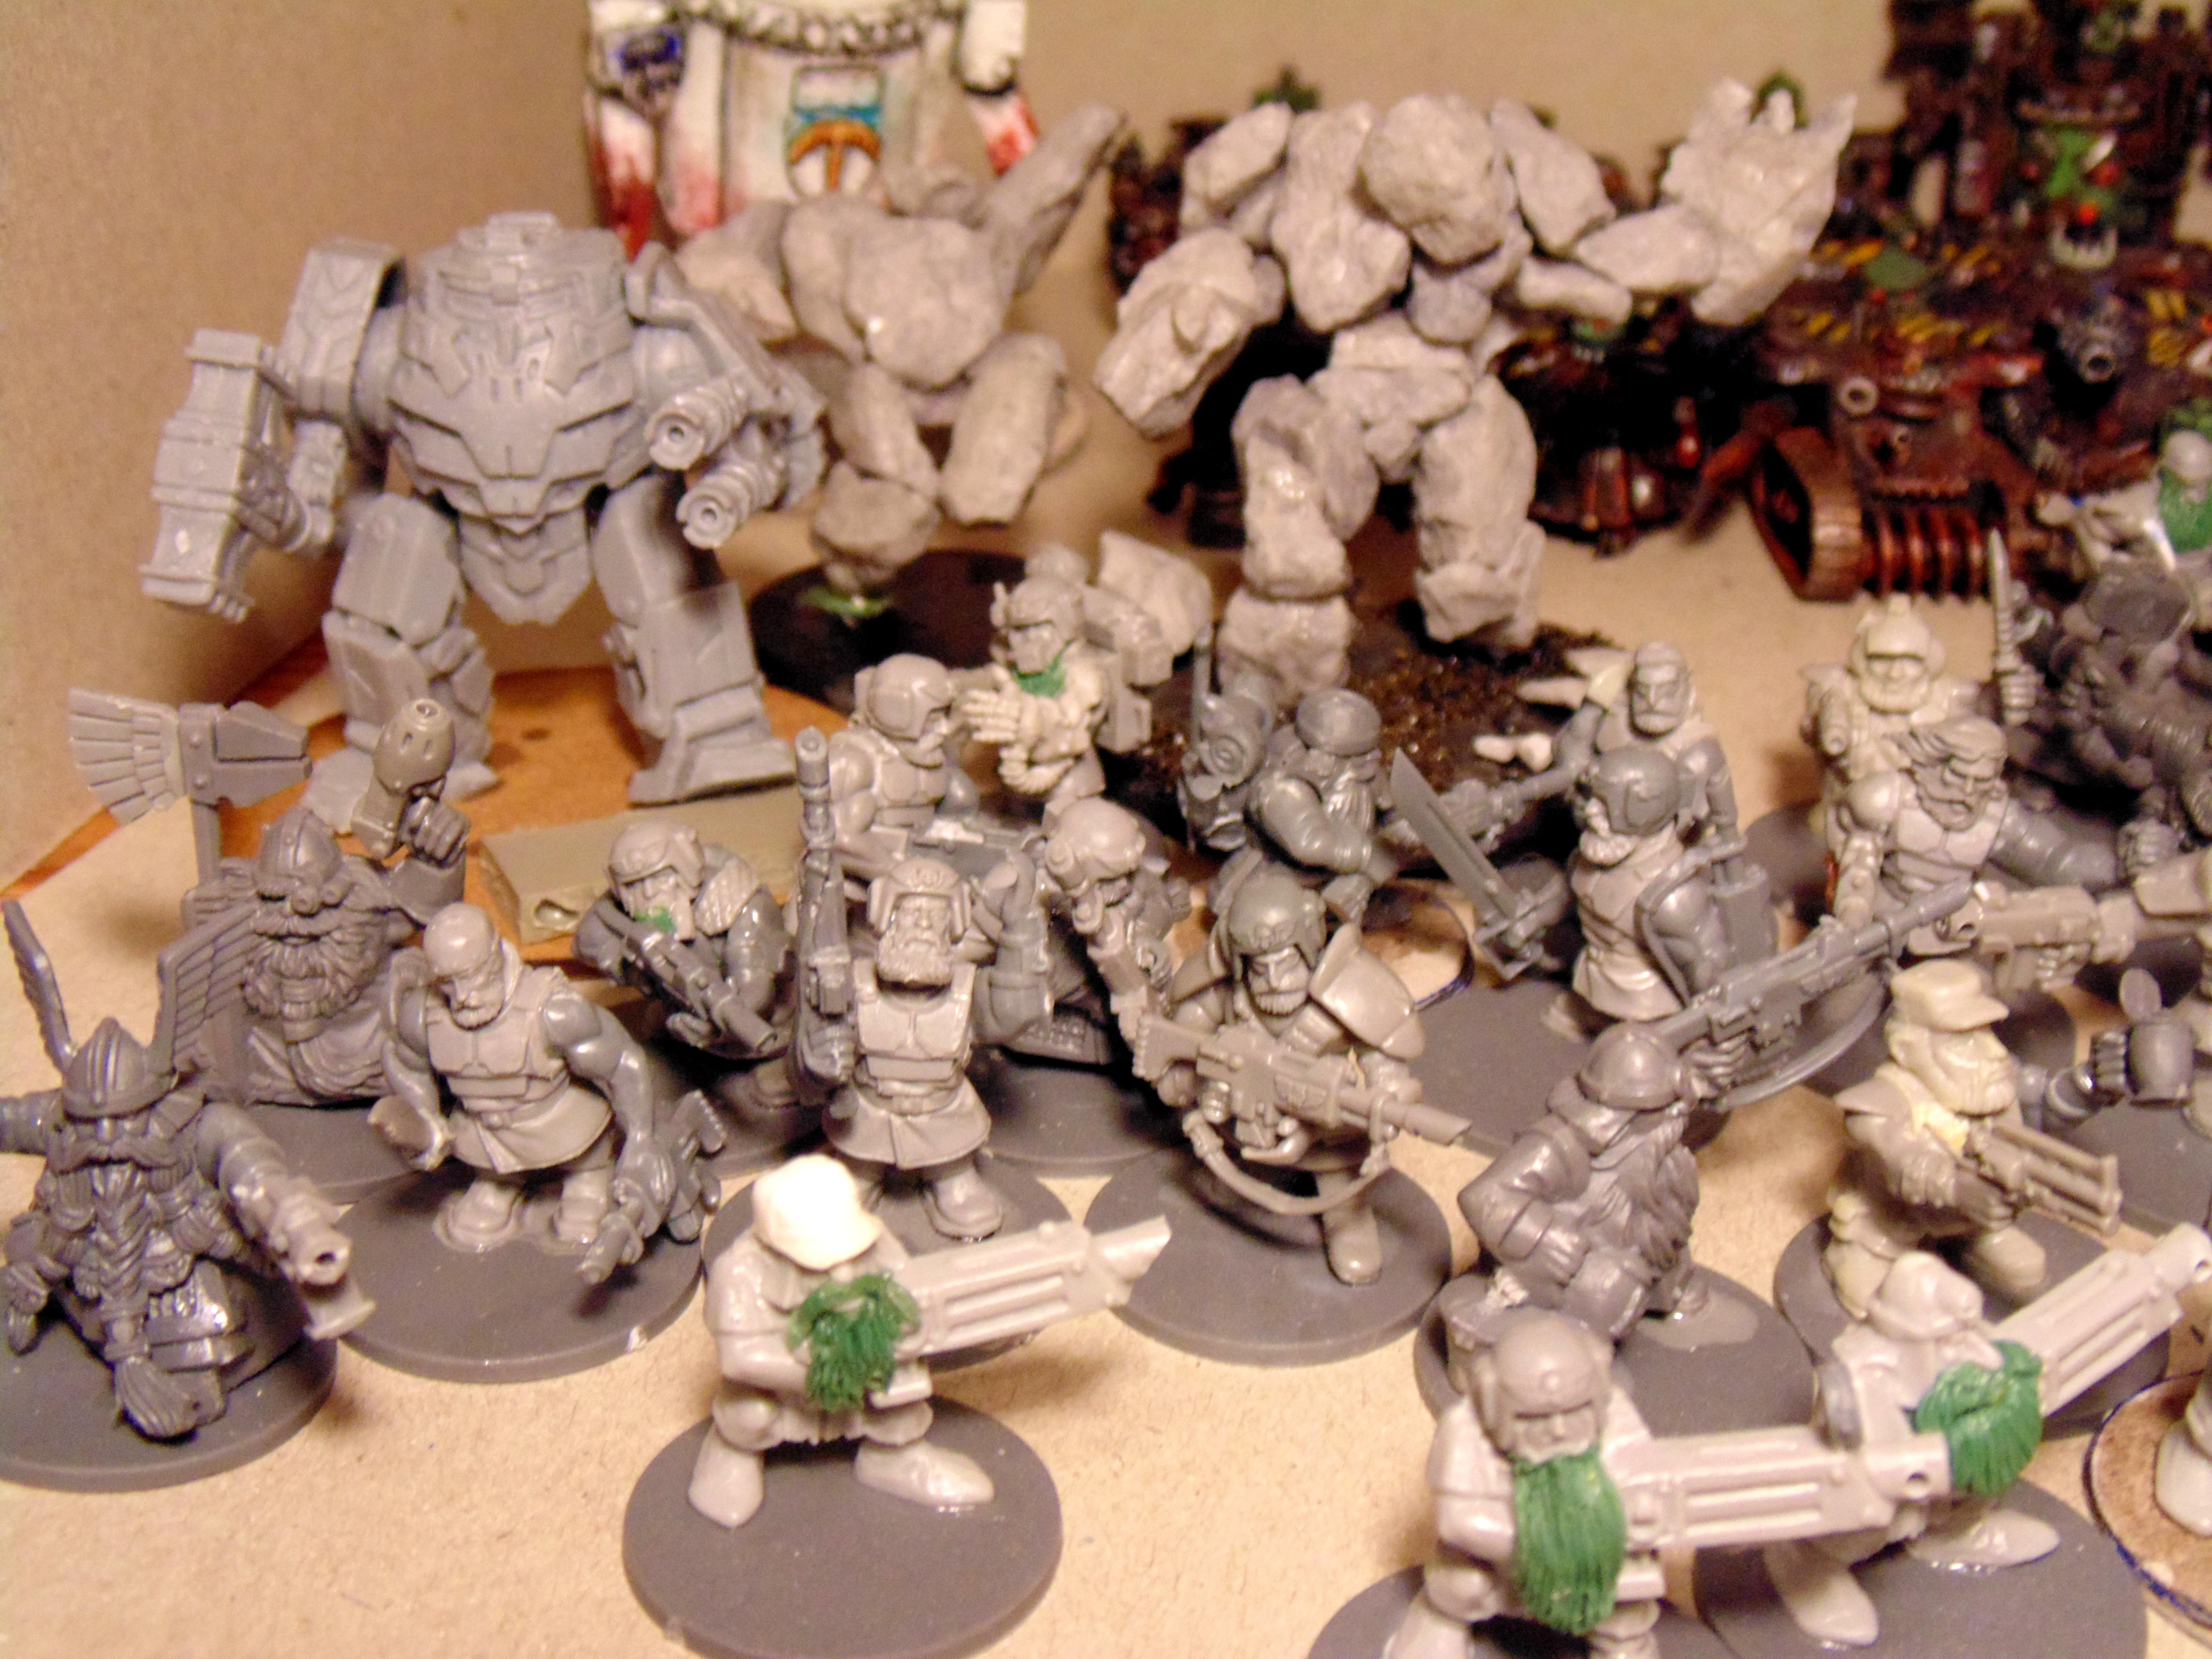 Army, Conversion, Creatures, Green, Heavy, Imp, Metal, Squats, Stone, Stuff